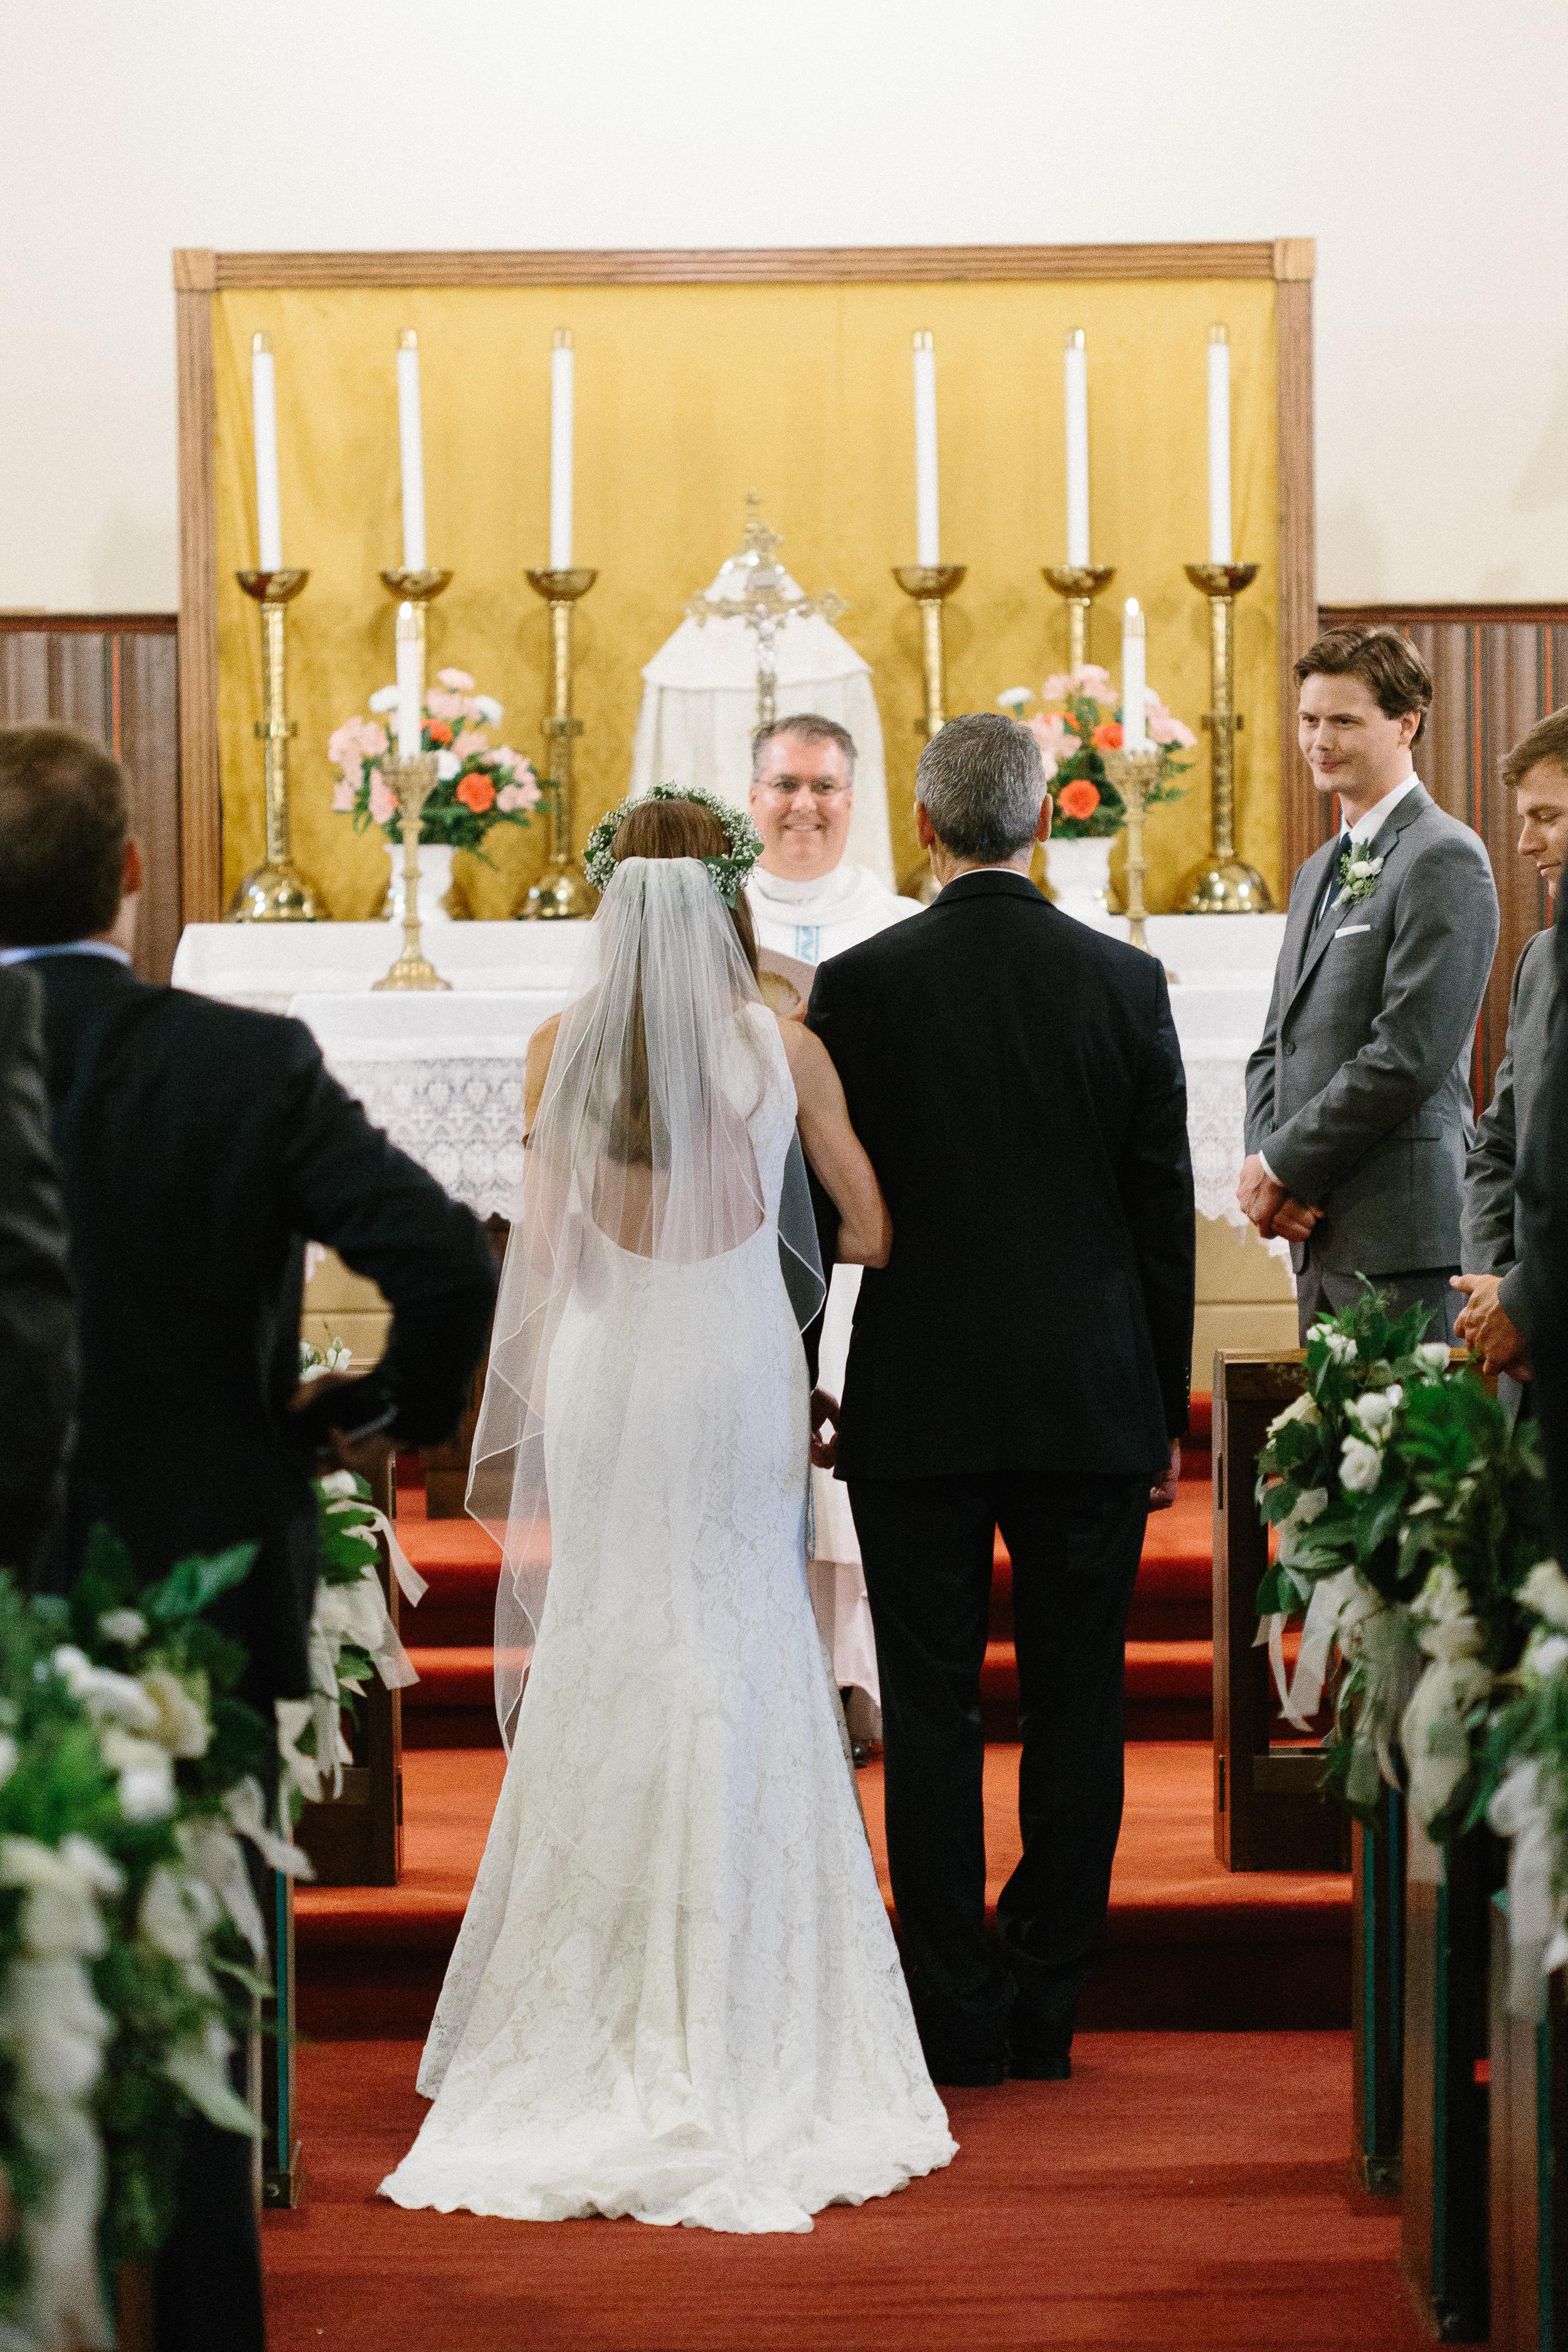 bride-processing-down-the-aisle-catholic-ceremony